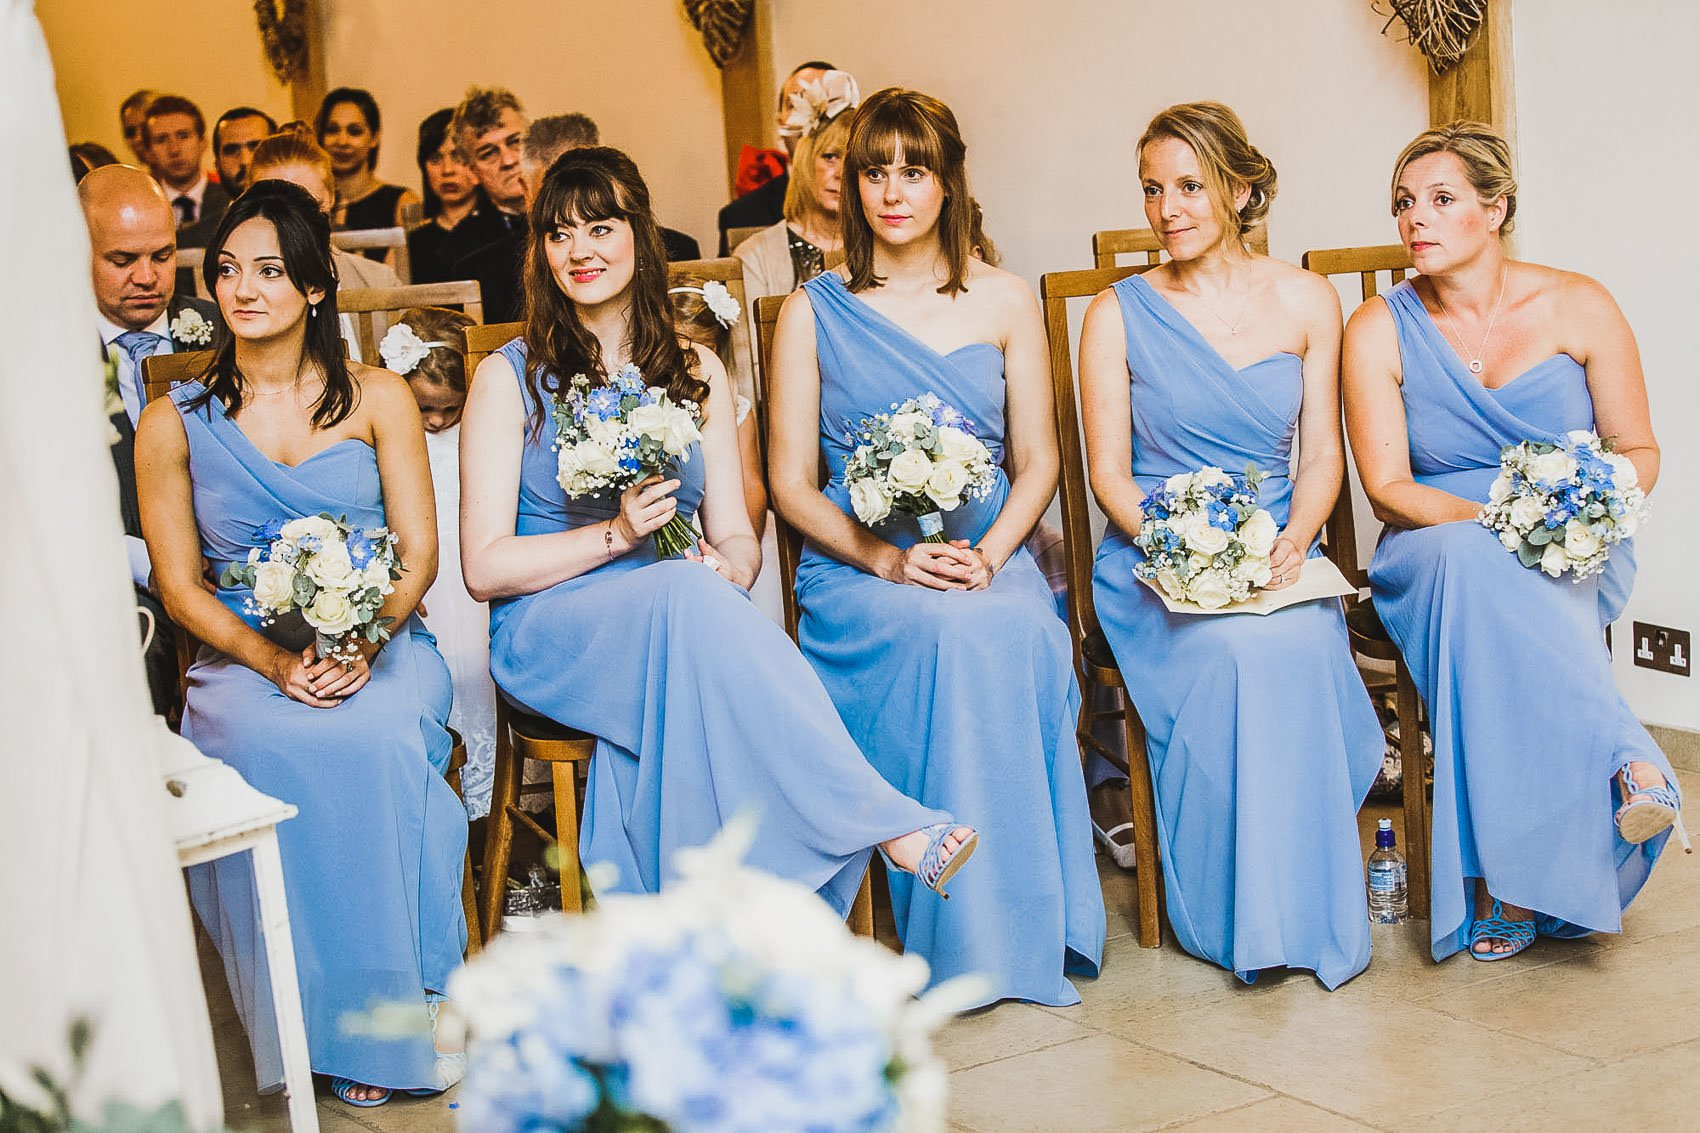 Rivervale Barn Wedding Photographer - Oli and Leyla 19